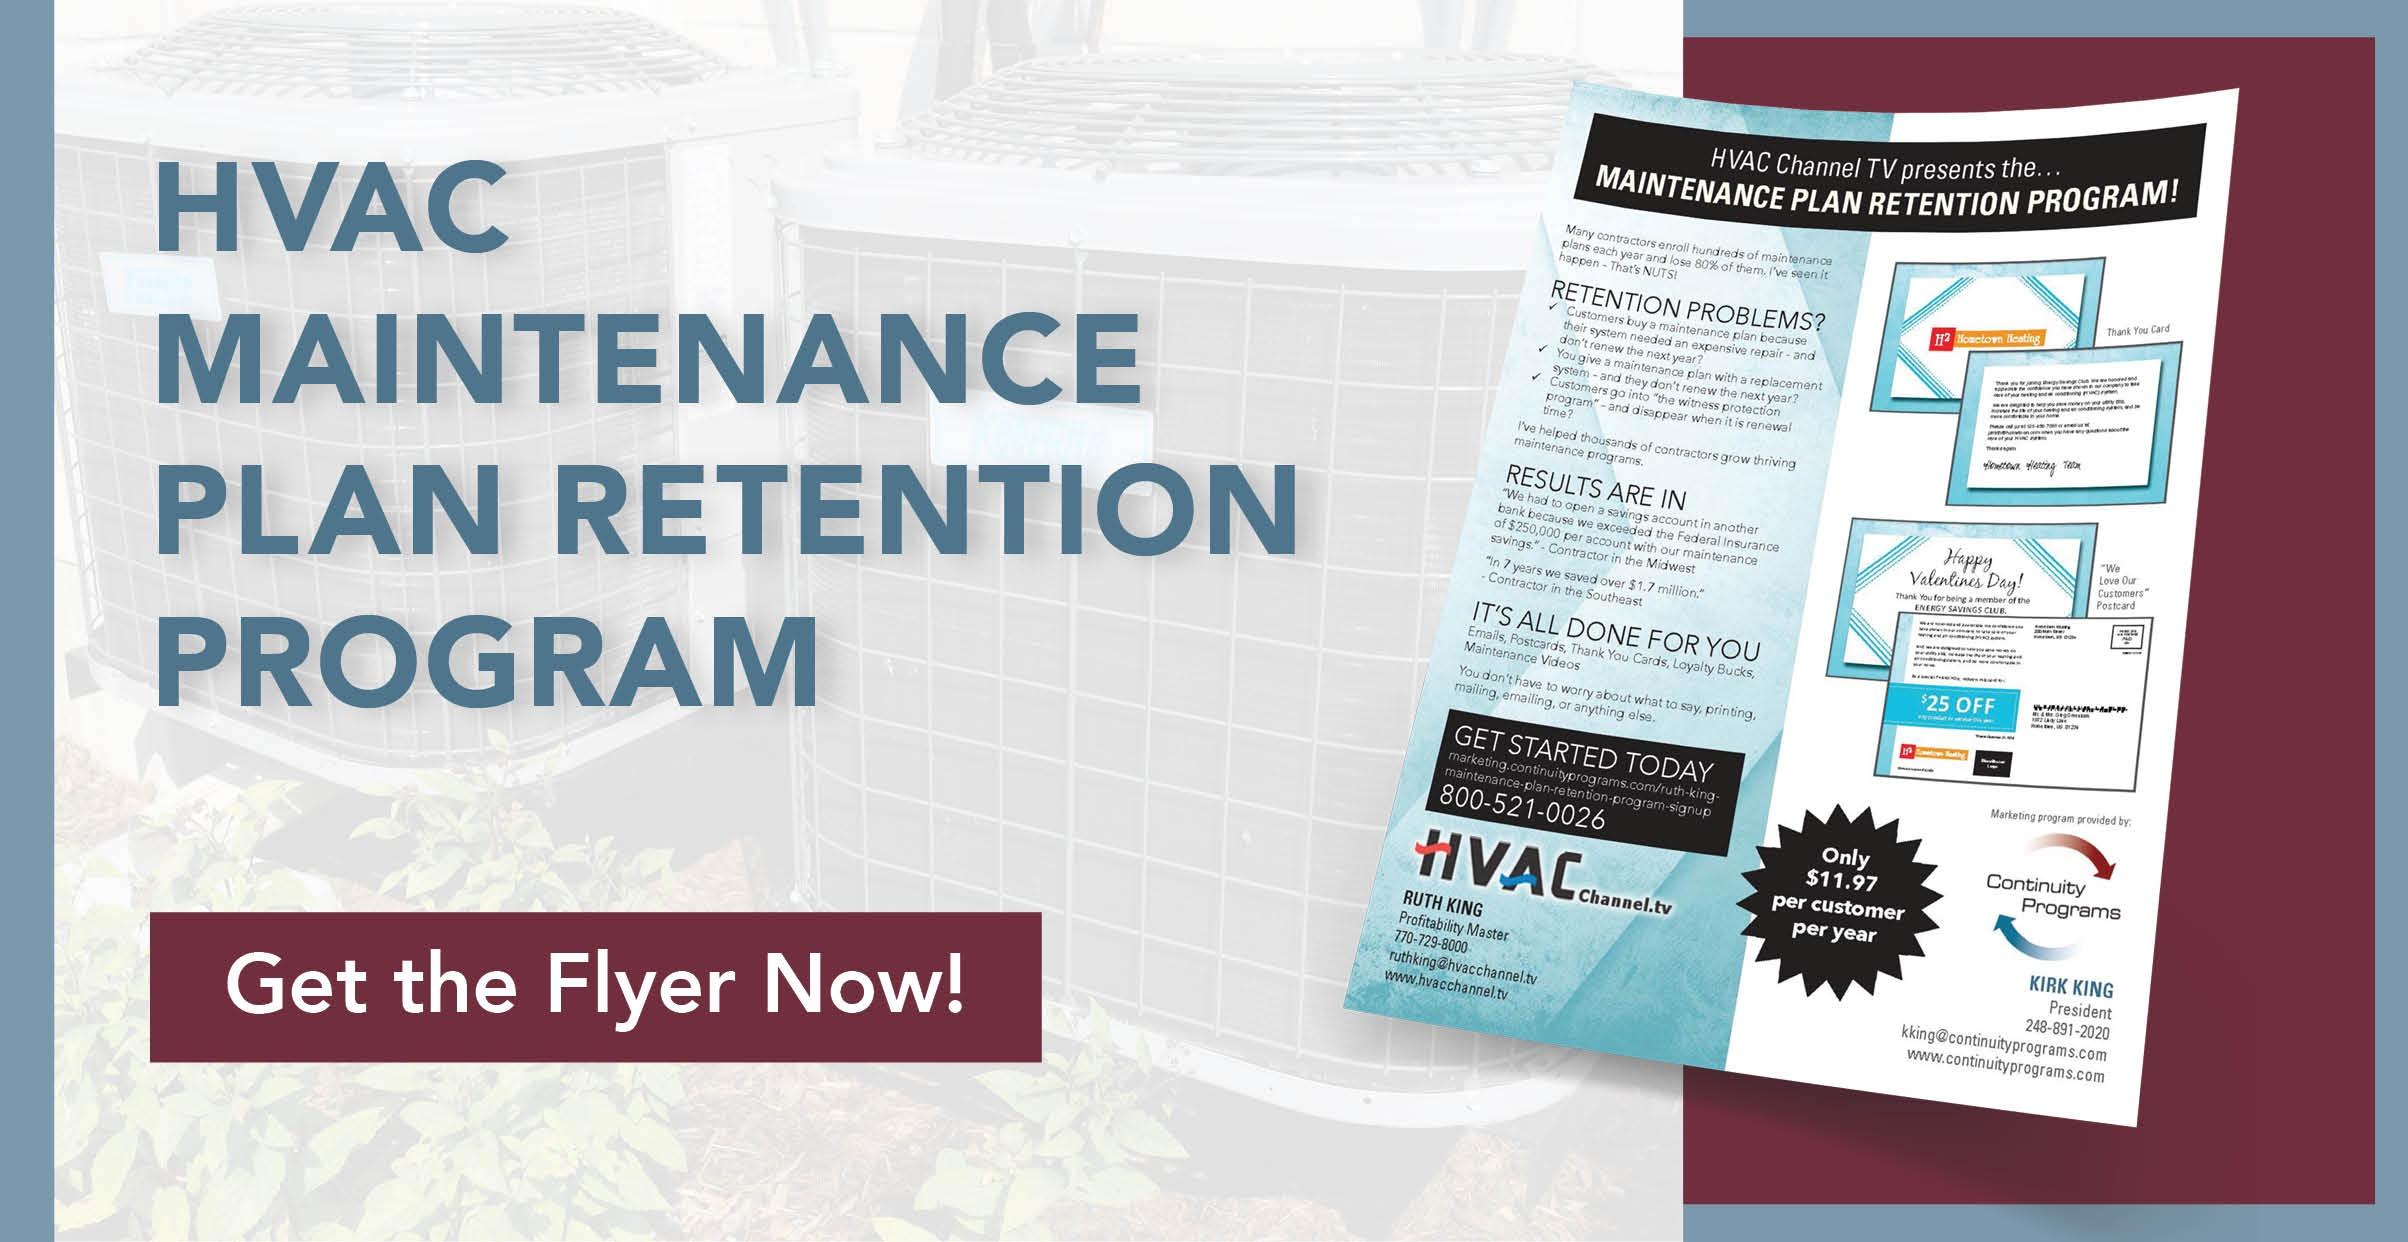 HVAC Maintenance Plan Retention Program (Ruth King)